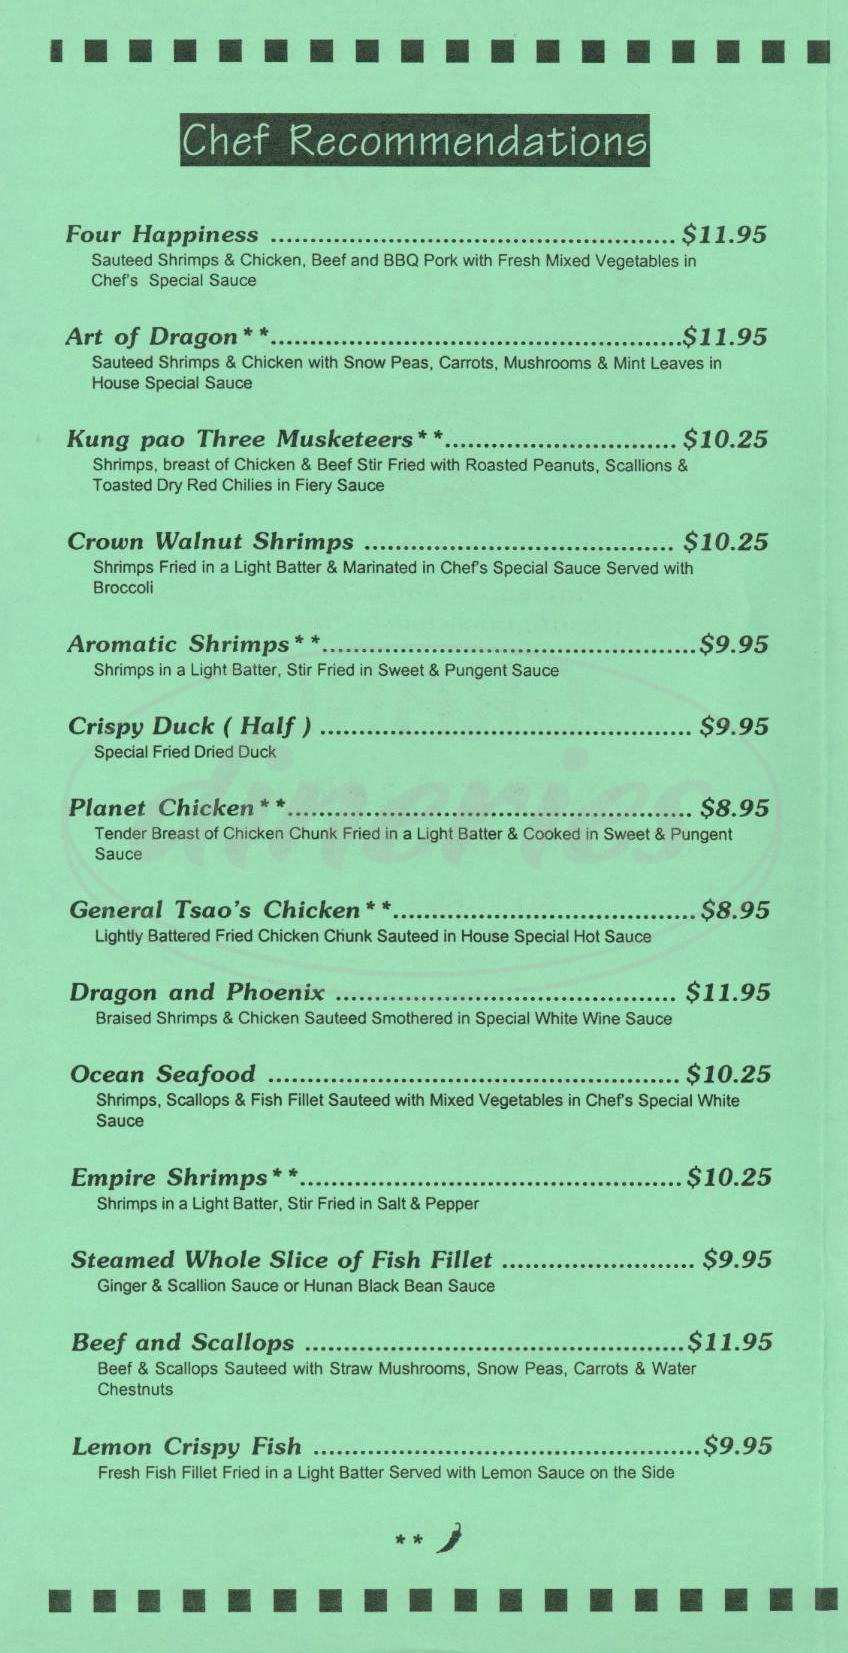 menu for Century Dragon